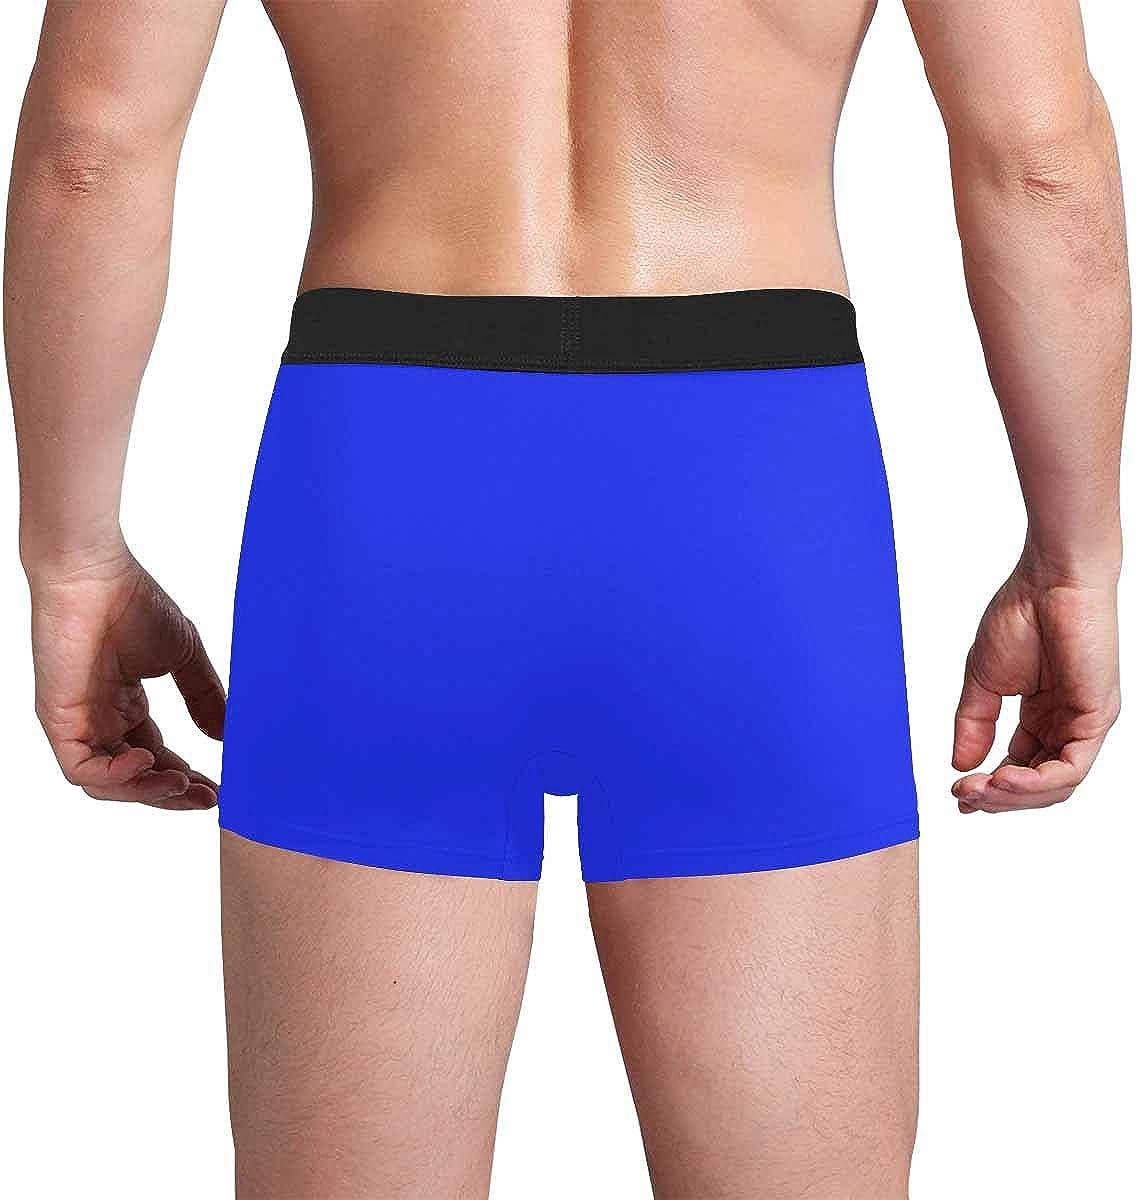 XS-XXXXXL Custom Boxers Face in The Heart Underwear Short Pants for Men